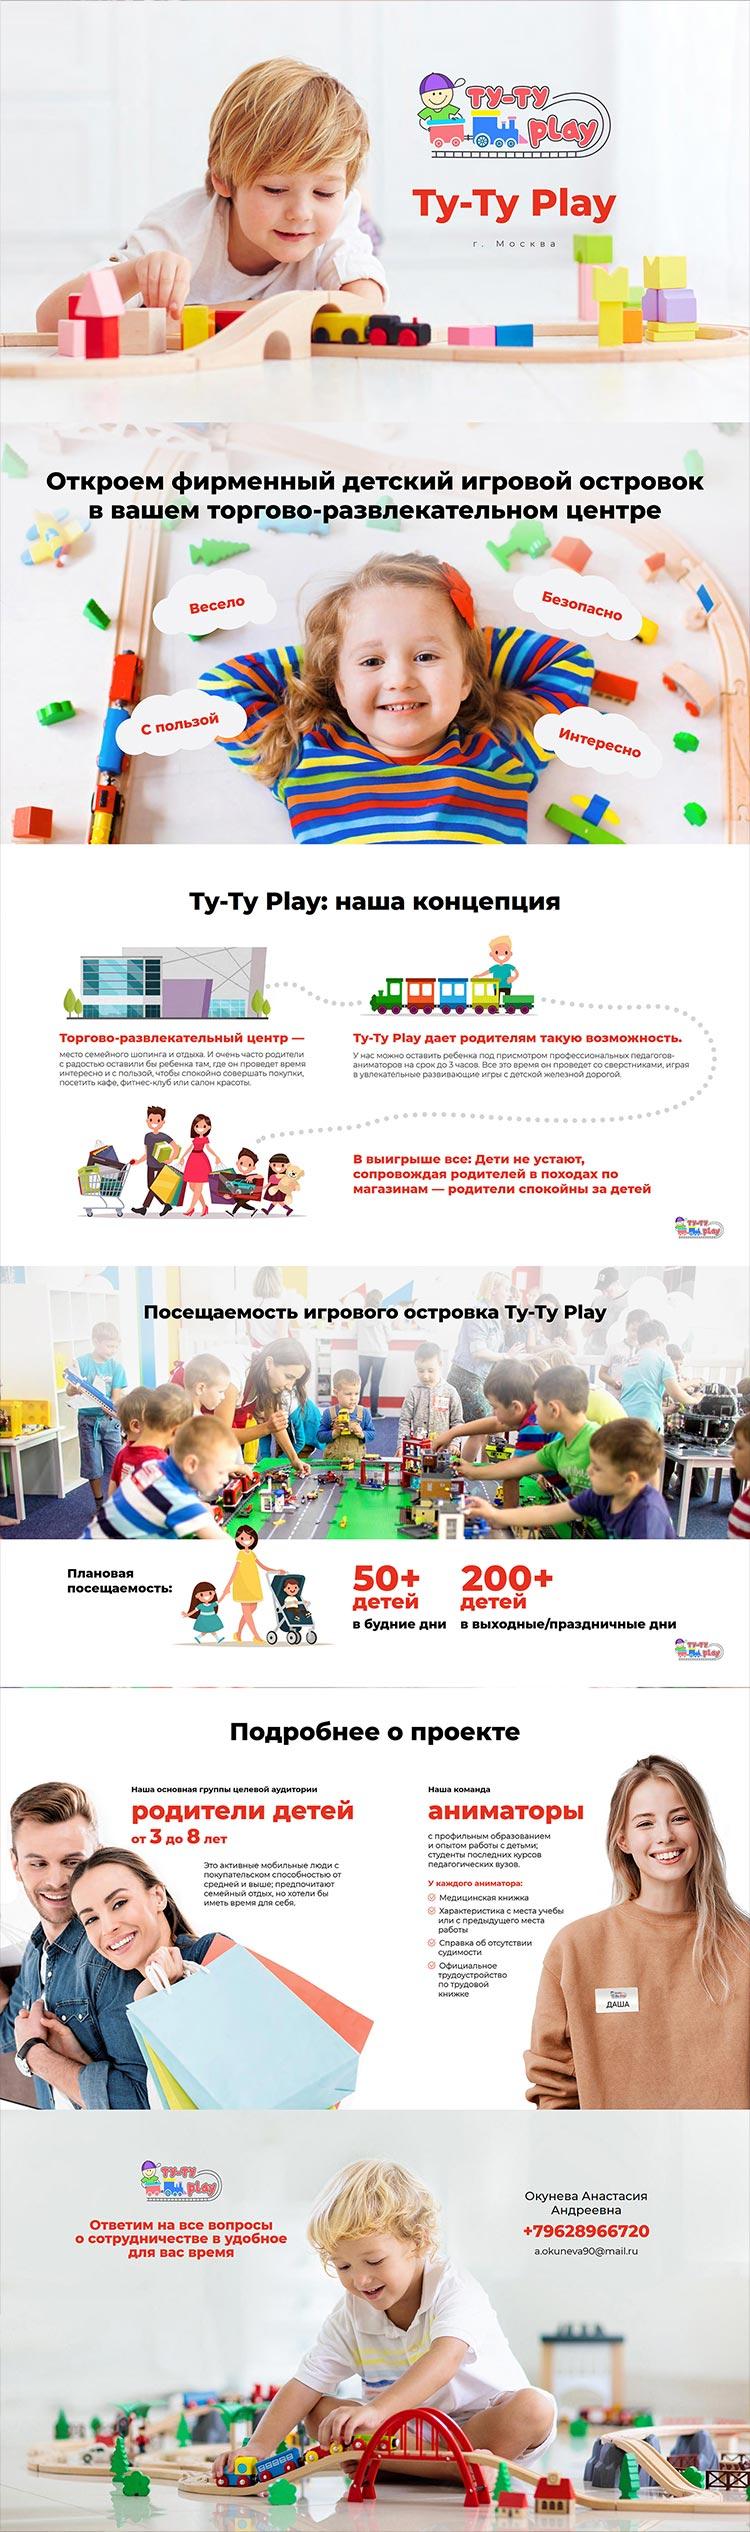 zakazat-Prezentacija-detskogo-igrovogo-ostrovka-dlja-TRC